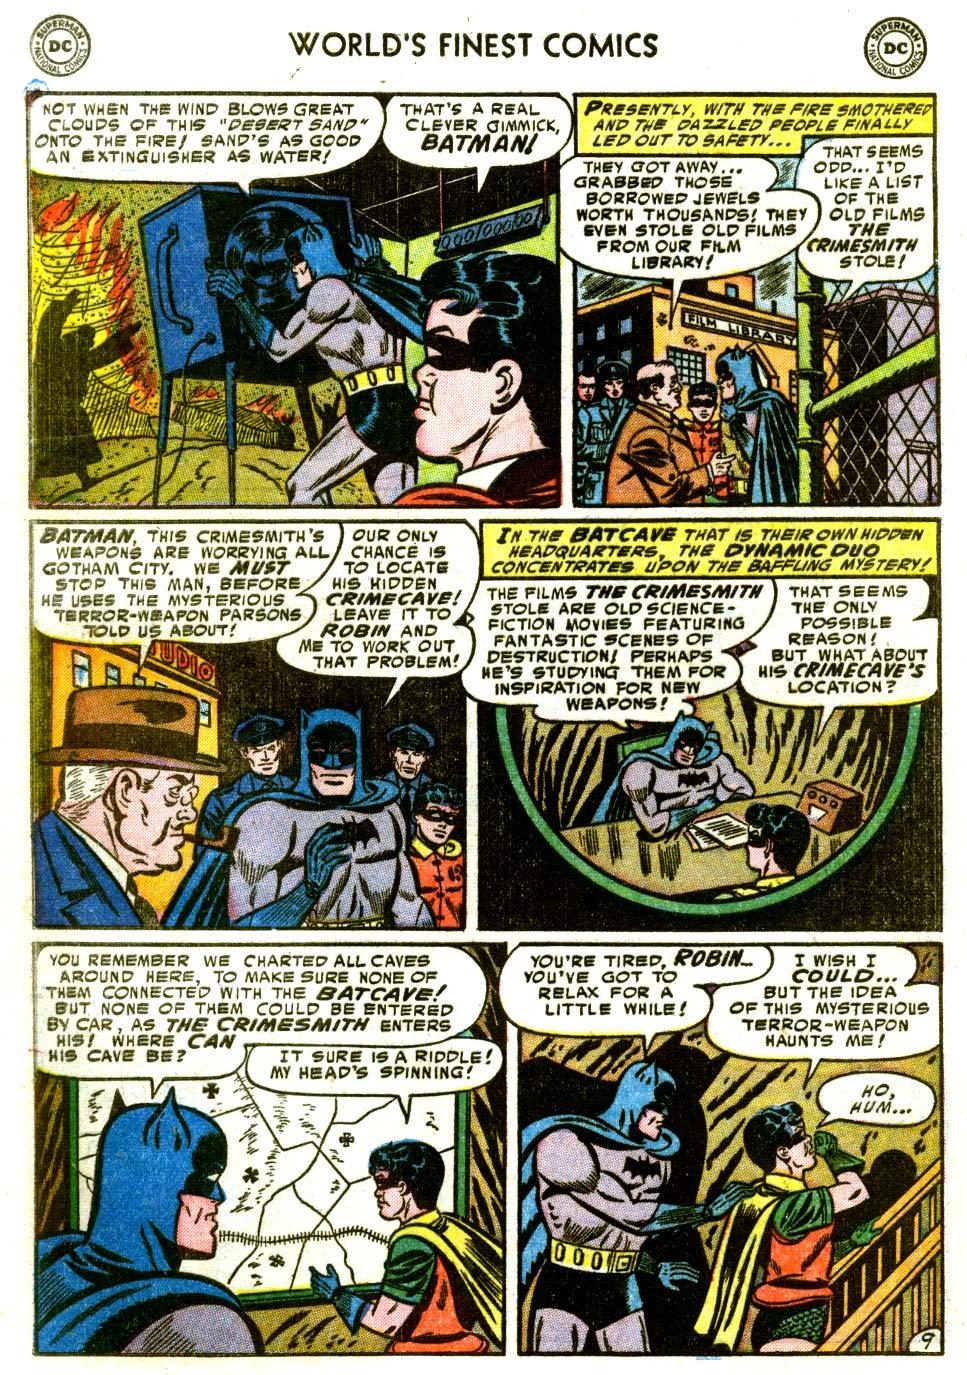 Read online World's Finest Comics comic -  Issue #68 - 62